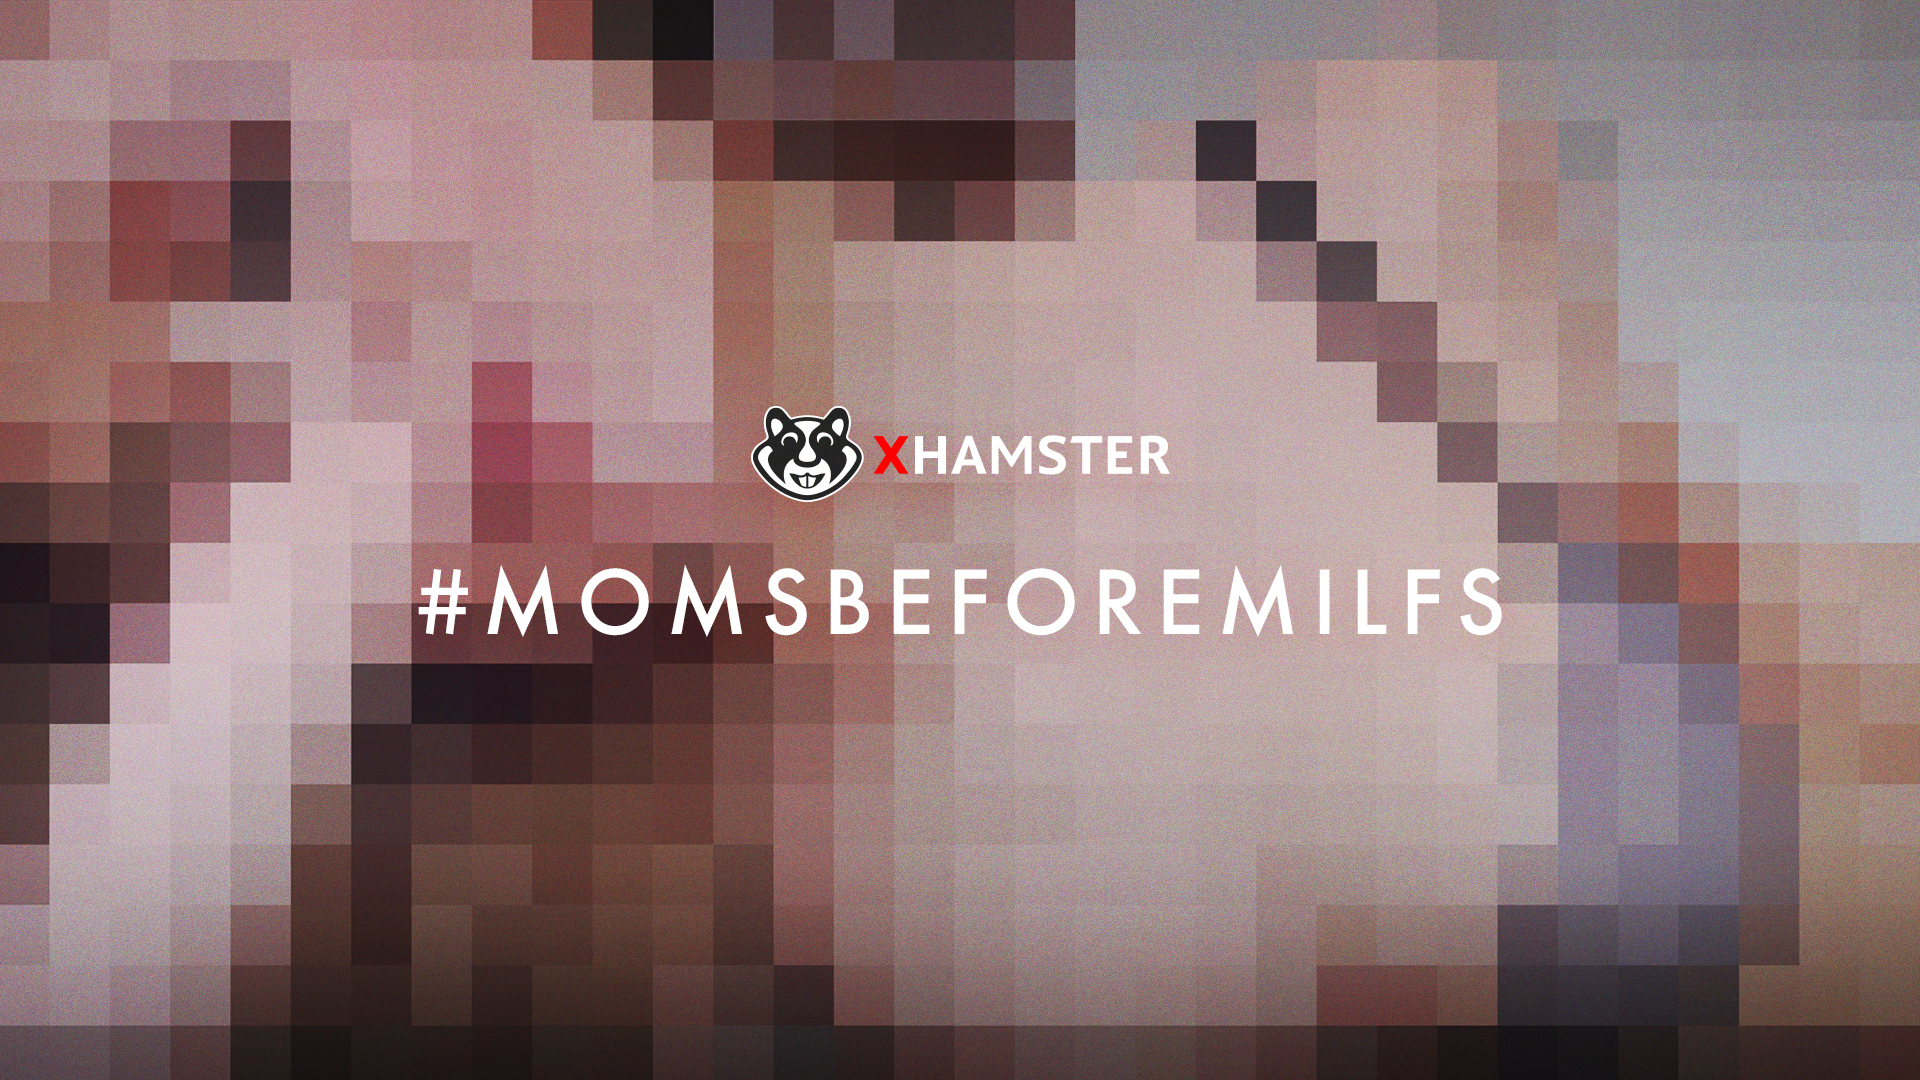 #MomsBeforeMILFs